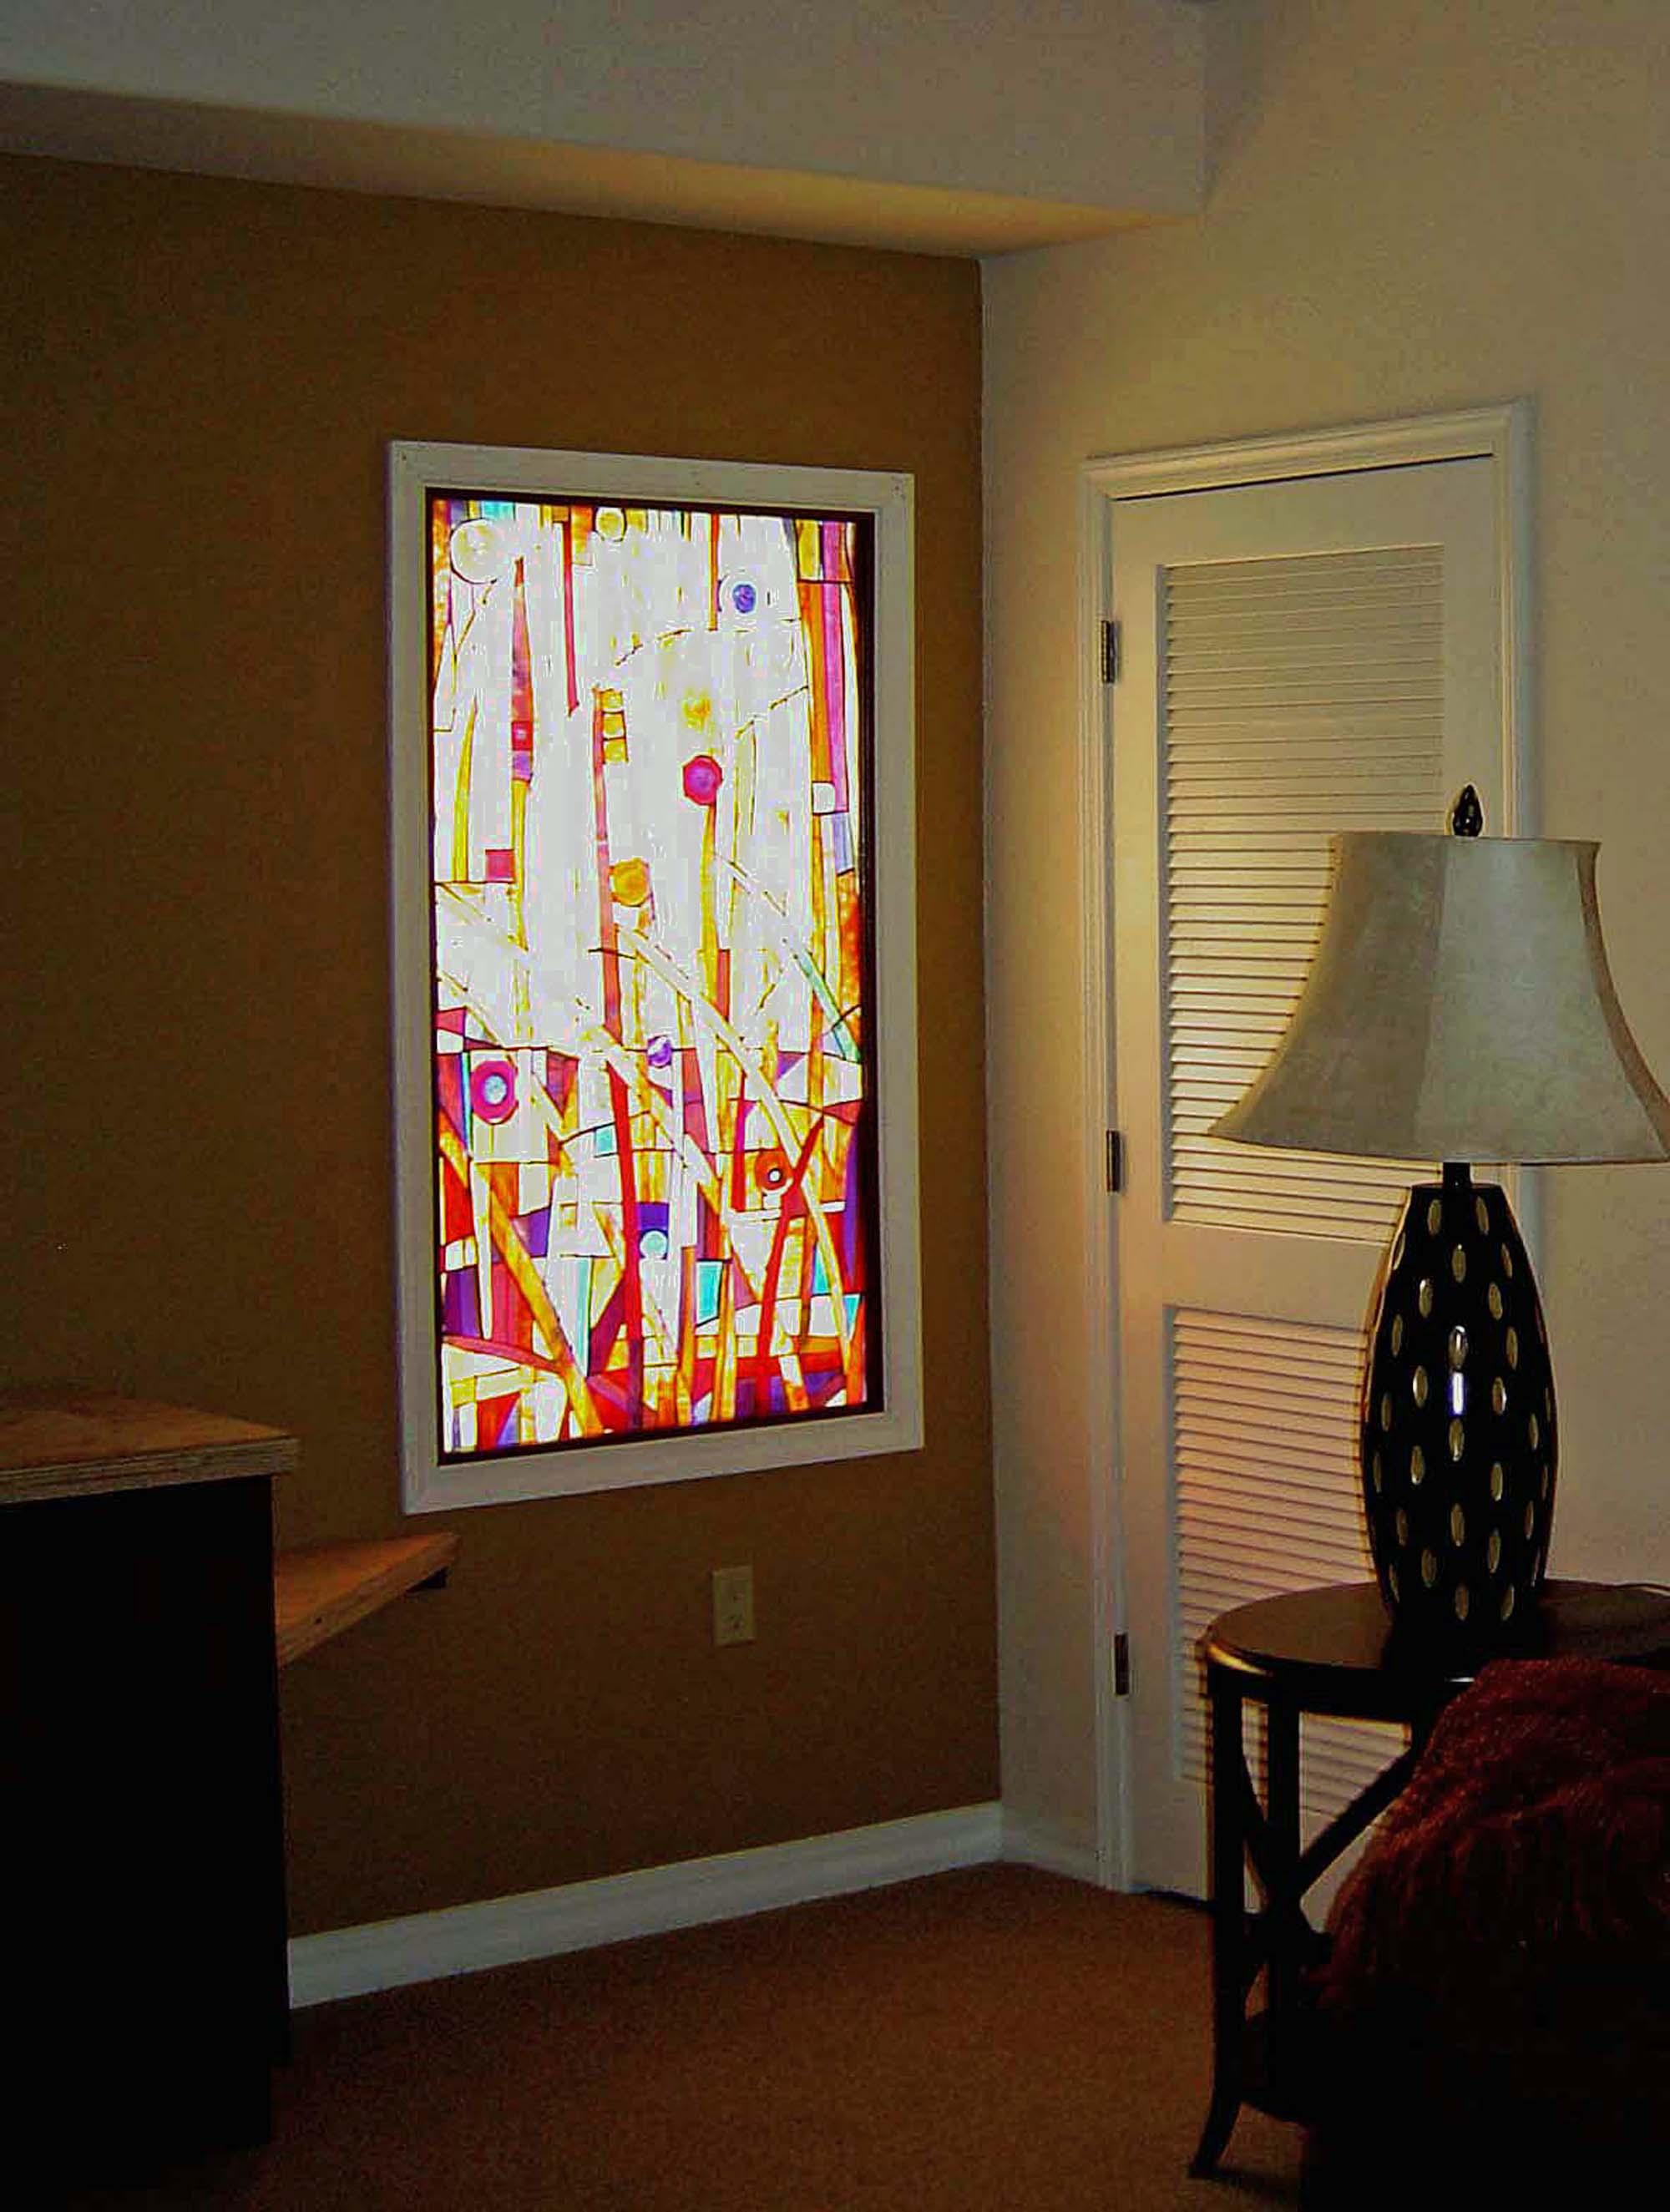 An odd window became a decorator's centerpiece.